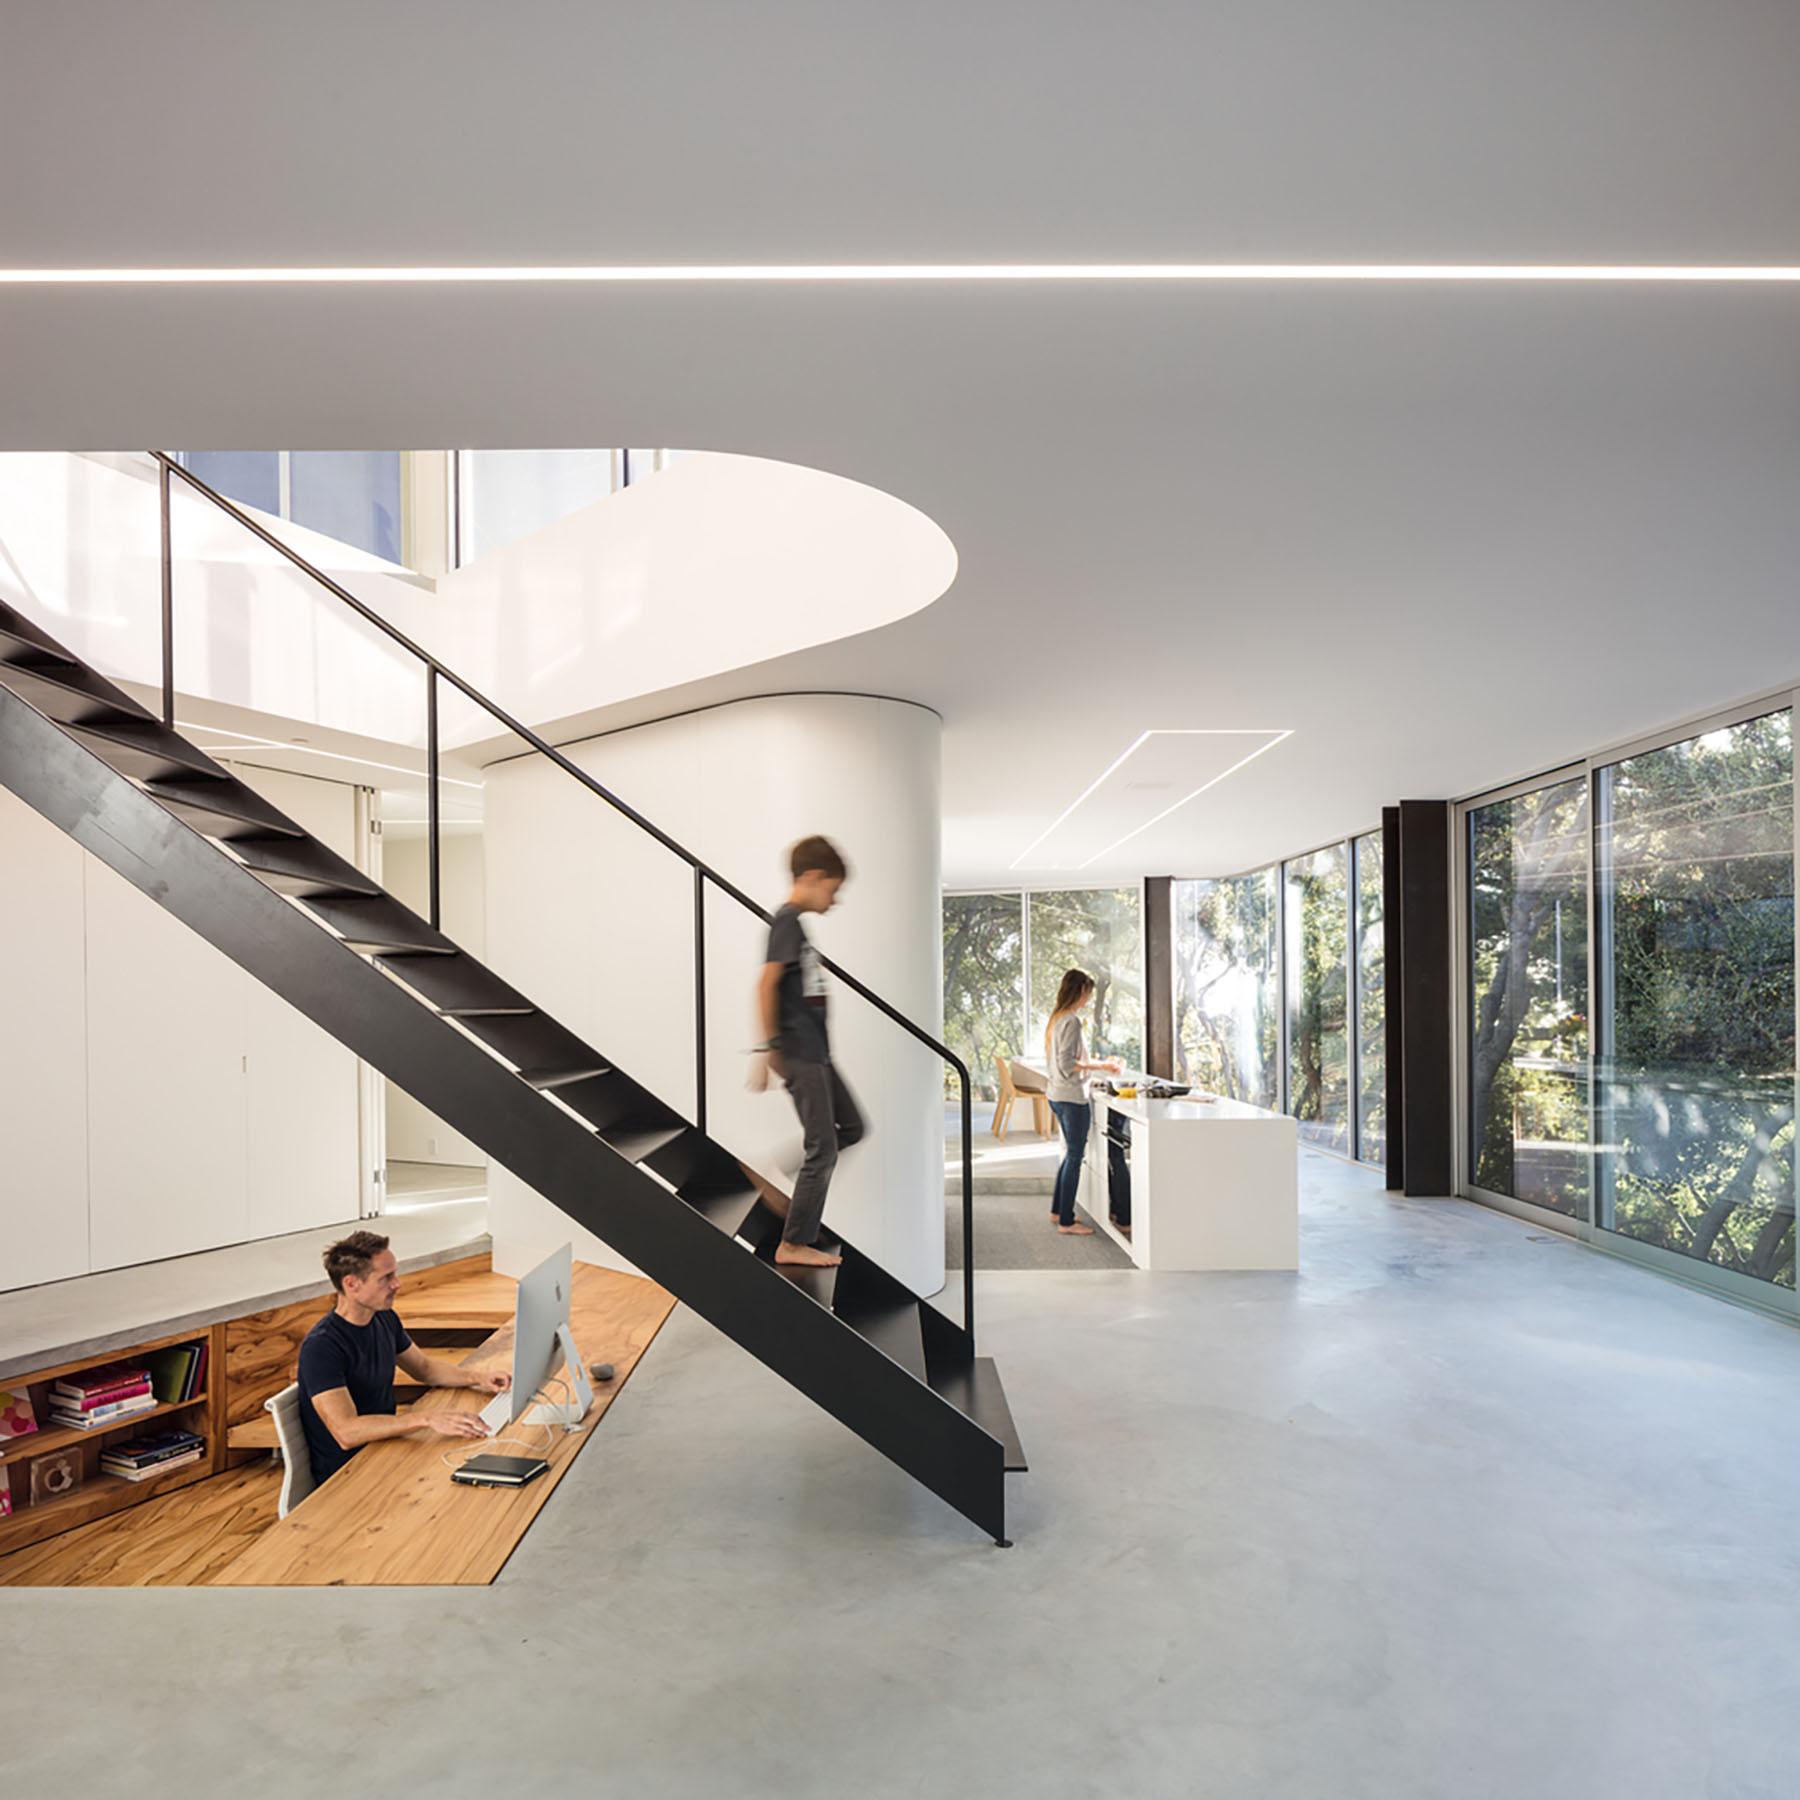 iGNANT-Architecture-Craig-Steely-Pam-Pauls-House-005b